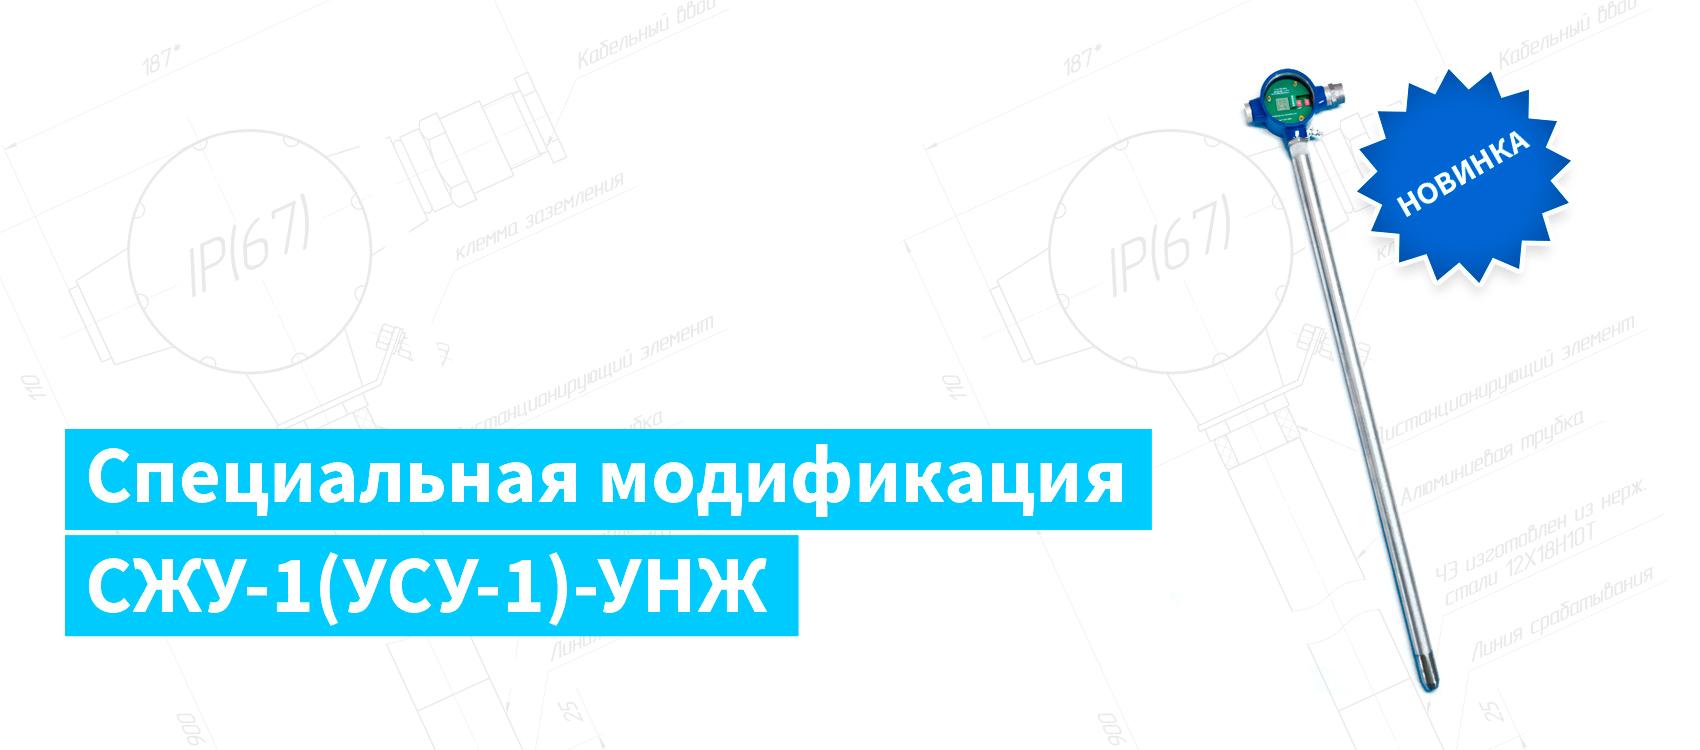 СЖУ-1(УСУ-1)-УНЖ